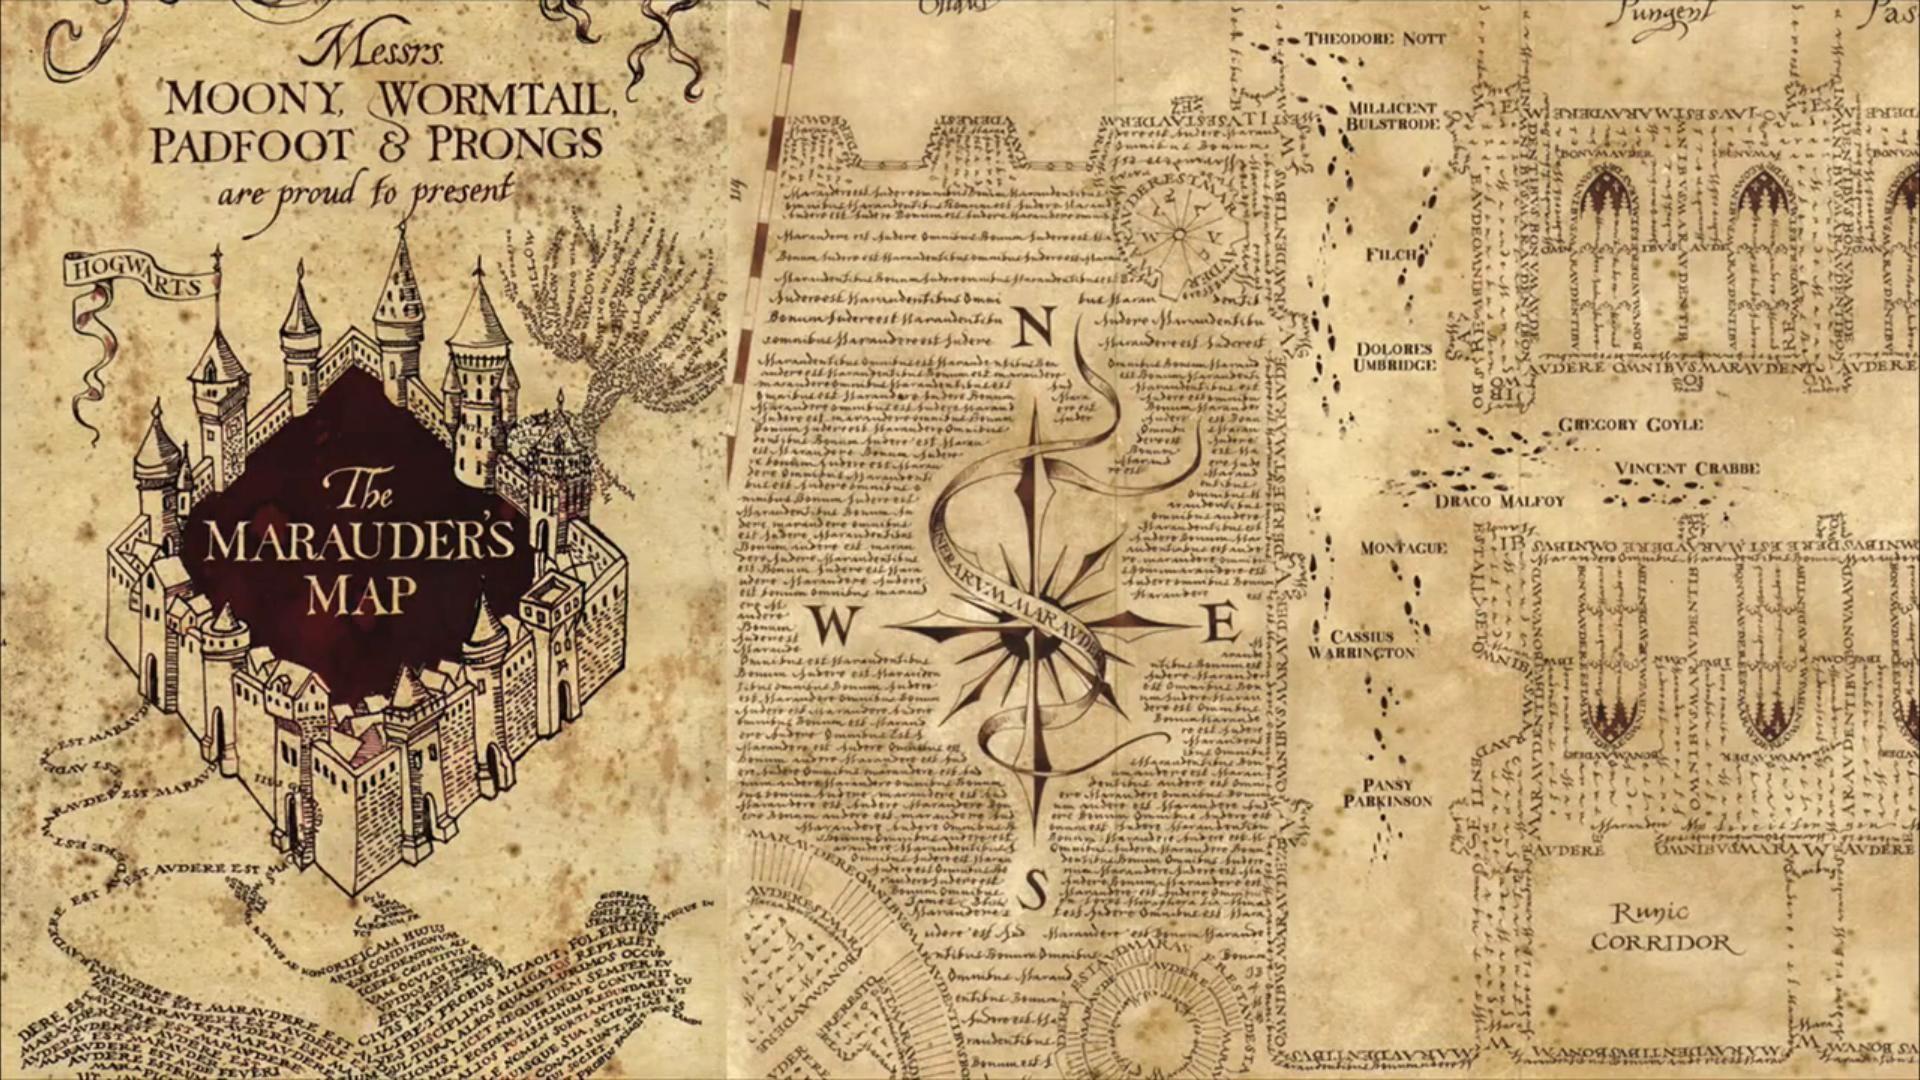 Harry Potter Karte Des Rumtreibers Spruch.Bildergebnis Für Karte Des Rumtreibers Kalender Harry Potter